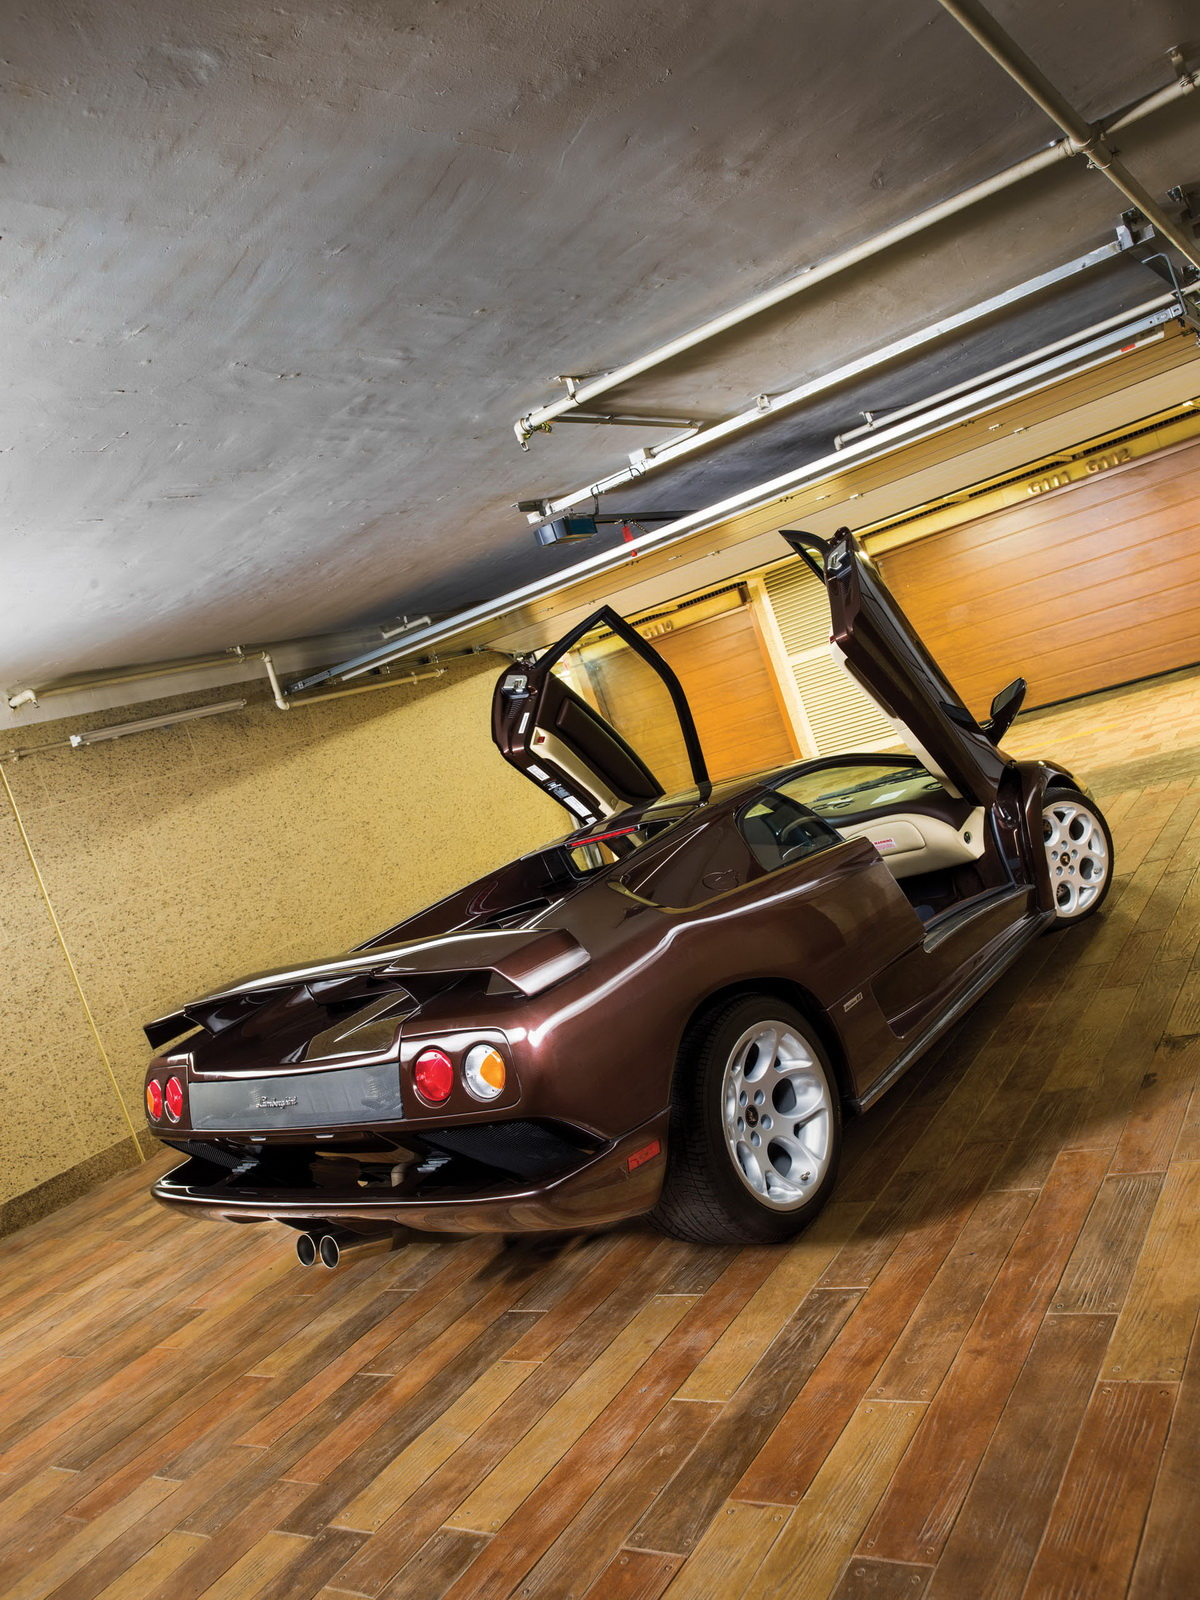 2001-Lamborghini-Diablo-VT-6-0-SE_1-copy.jpg